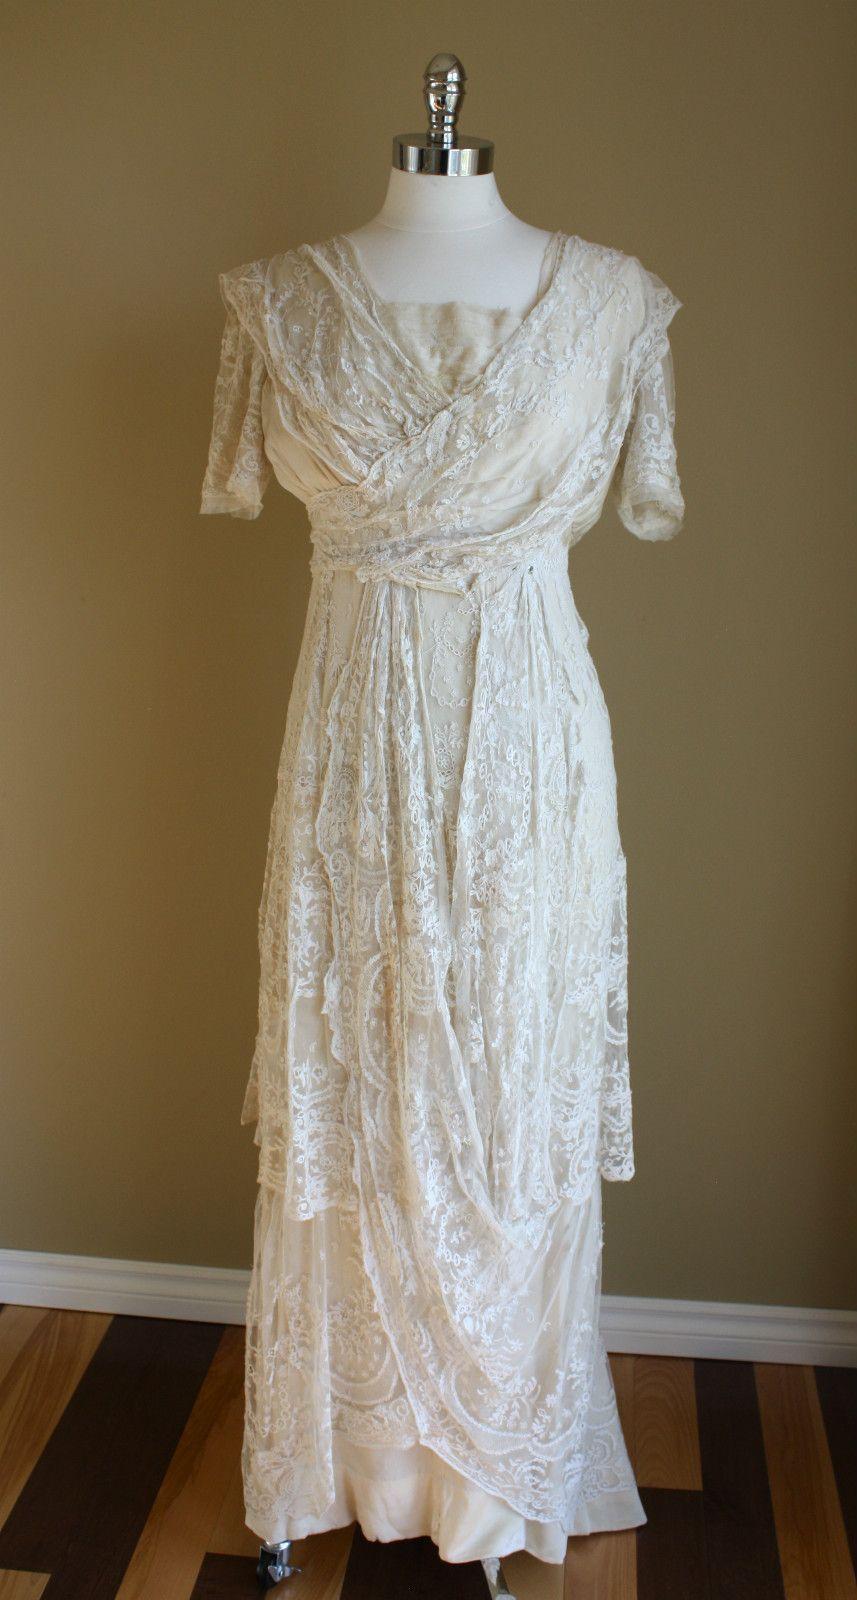 Edwardian Wedding Gown Ebay Evening Dresses For Weddings Evening Gowns Edwardian Gowns